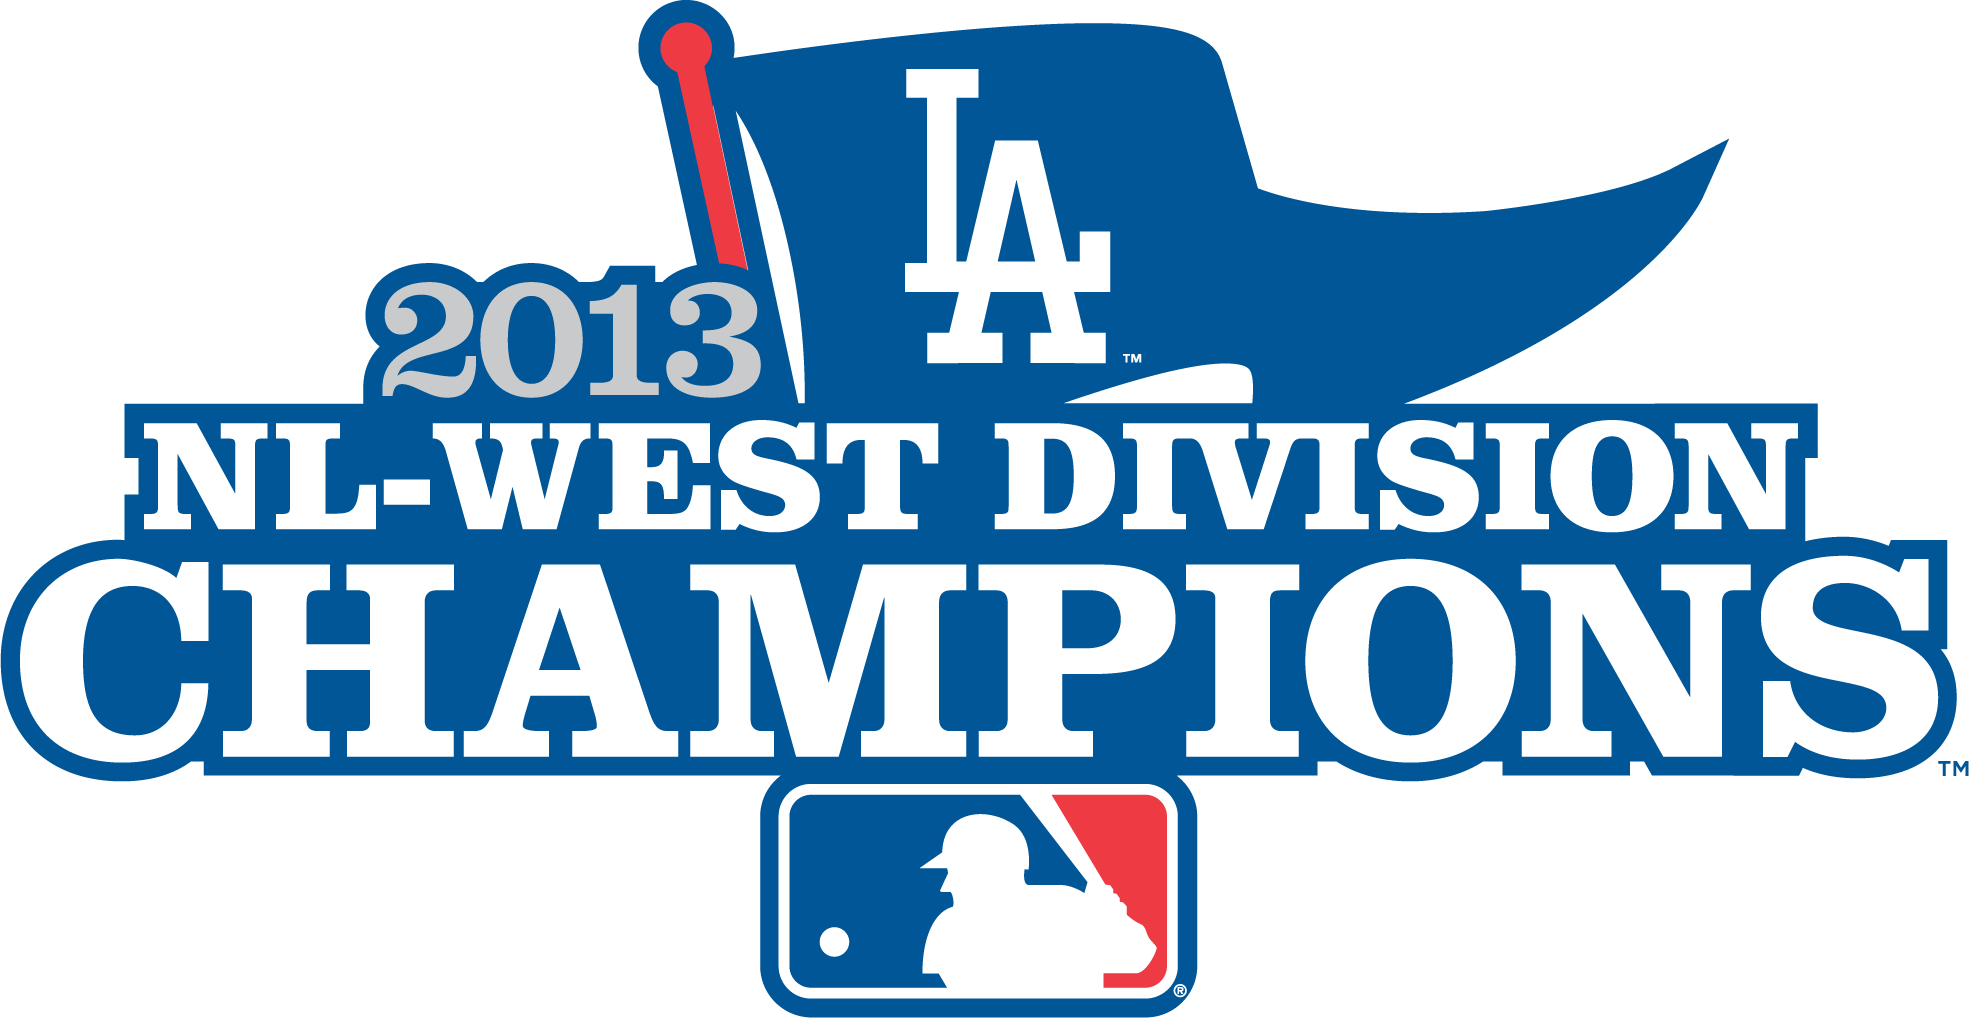 Los Angeles Dodgers Logo Champion Logo (2013) - Los Angeles Dodgers 2013 NL West Division Champions logo SportsLogos.Net